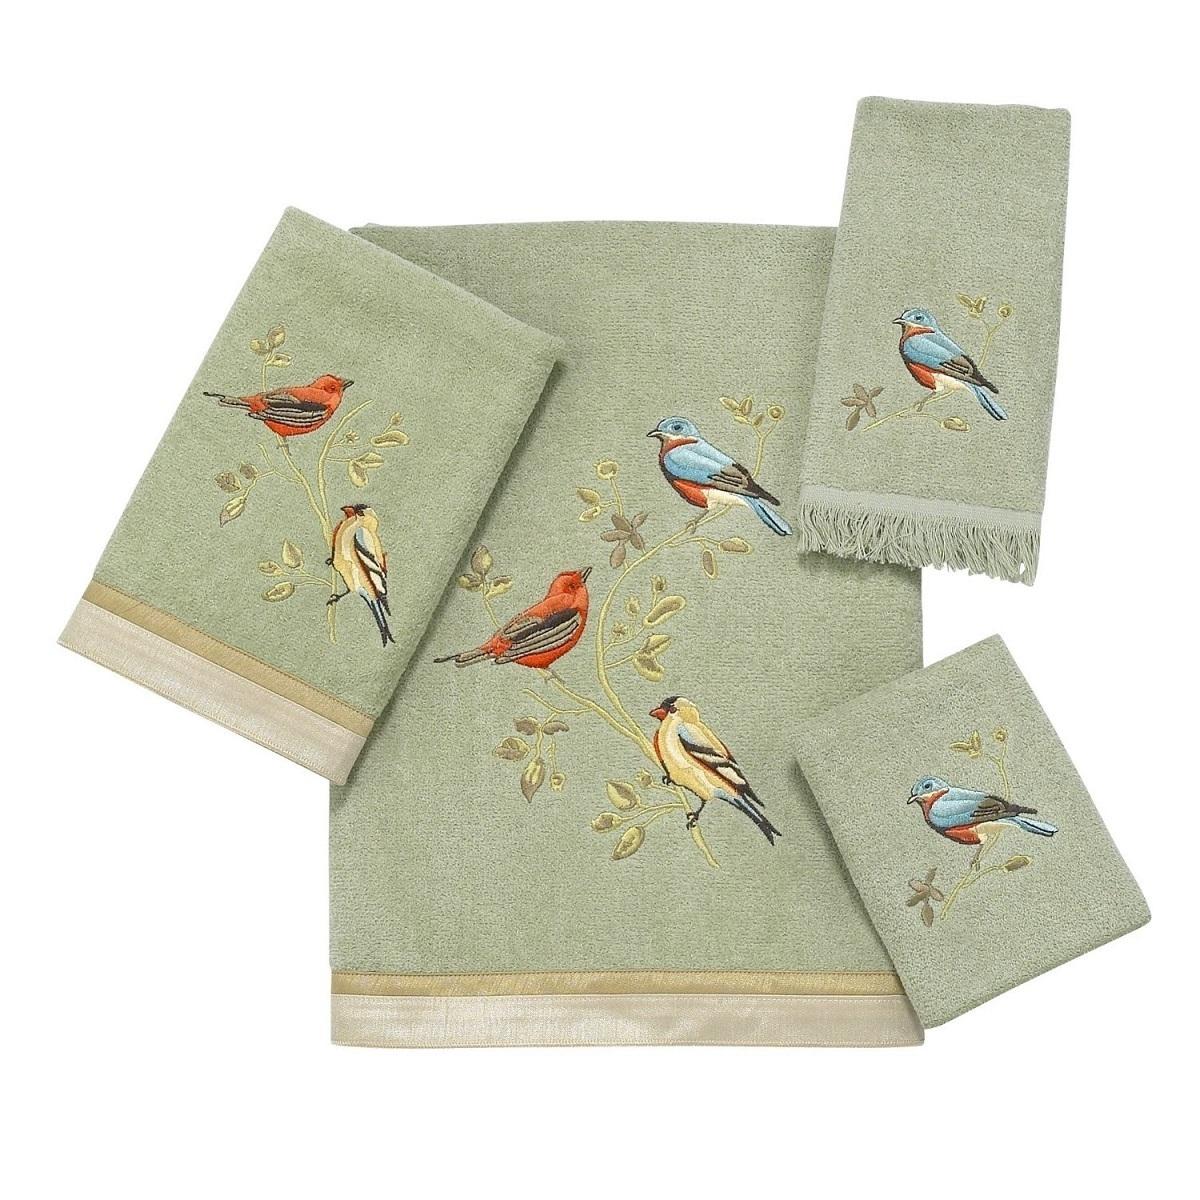 Полотенца Полотенце 41х76 Avanti Gilded Birds зеленое elitnoe-polotentse-mahrovoe-gilded-birds-zelyonoe-ot-avanti-kanada-nabor.jpg